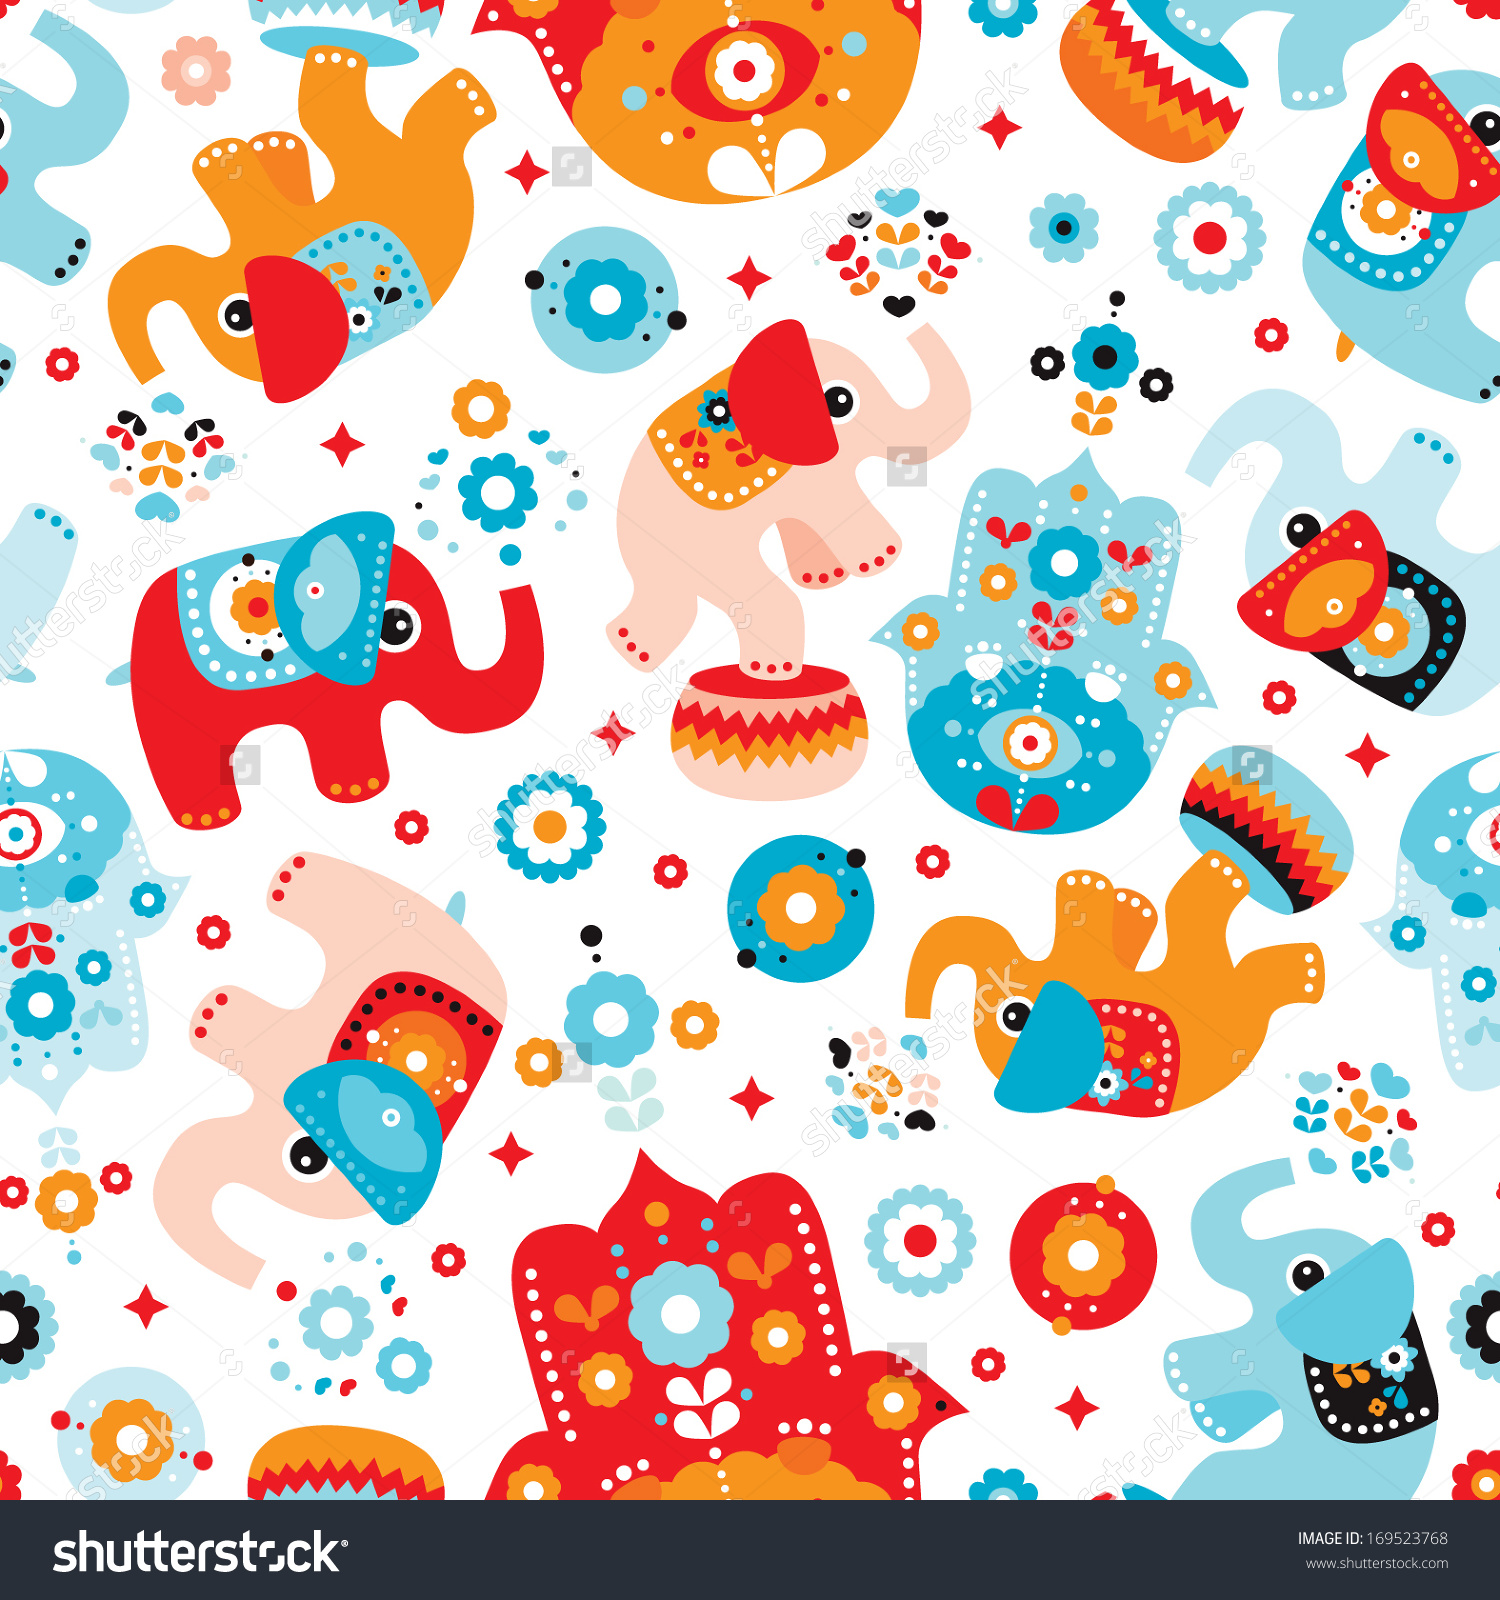 Seamless Retro Elephant Kids Illustration Arabic Stock Vector.